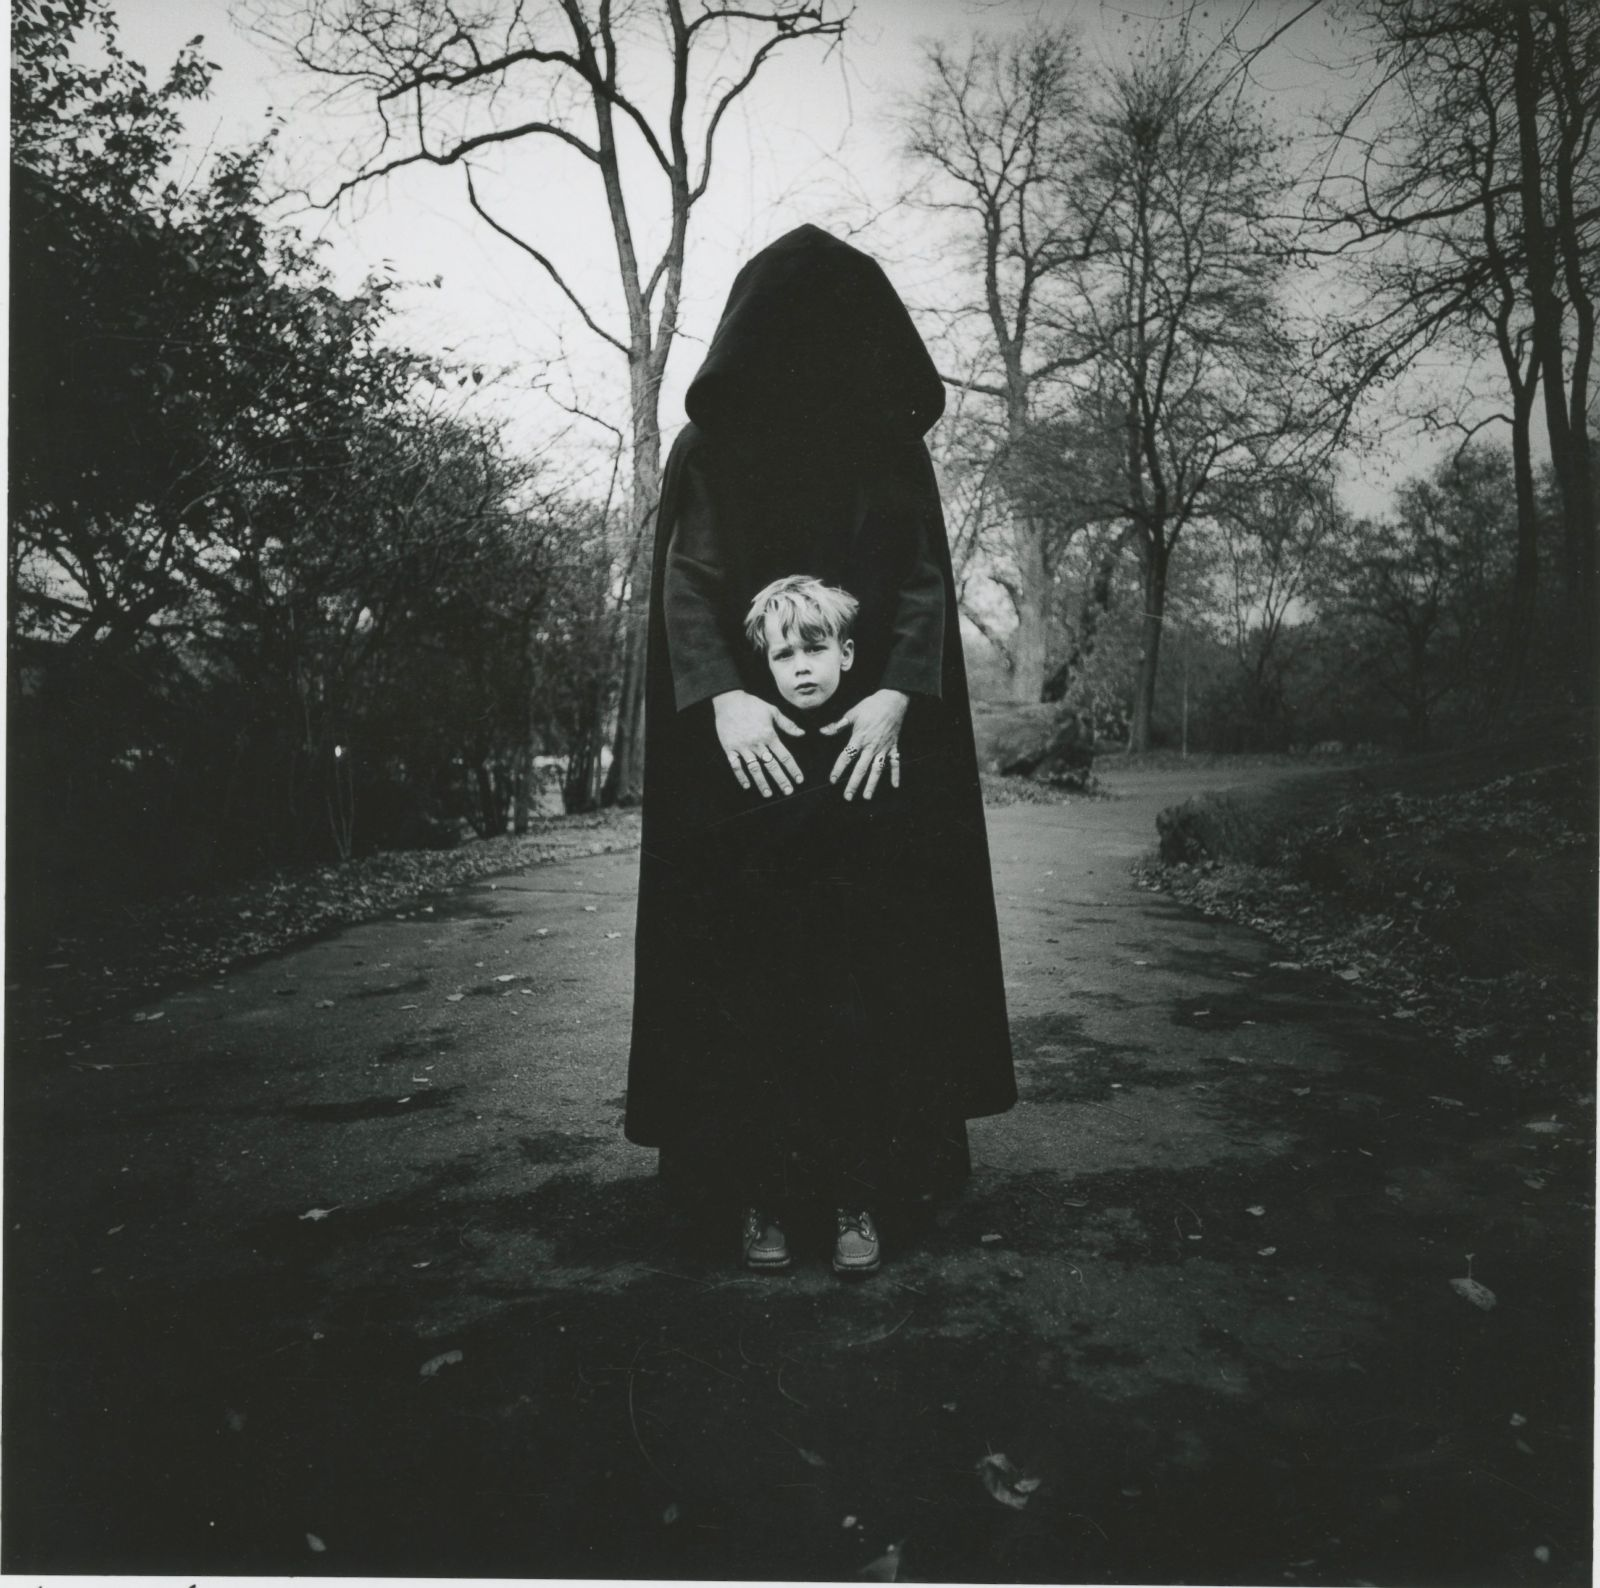 Children S Scary Dreams Come Alive Photos Image 3 Abc